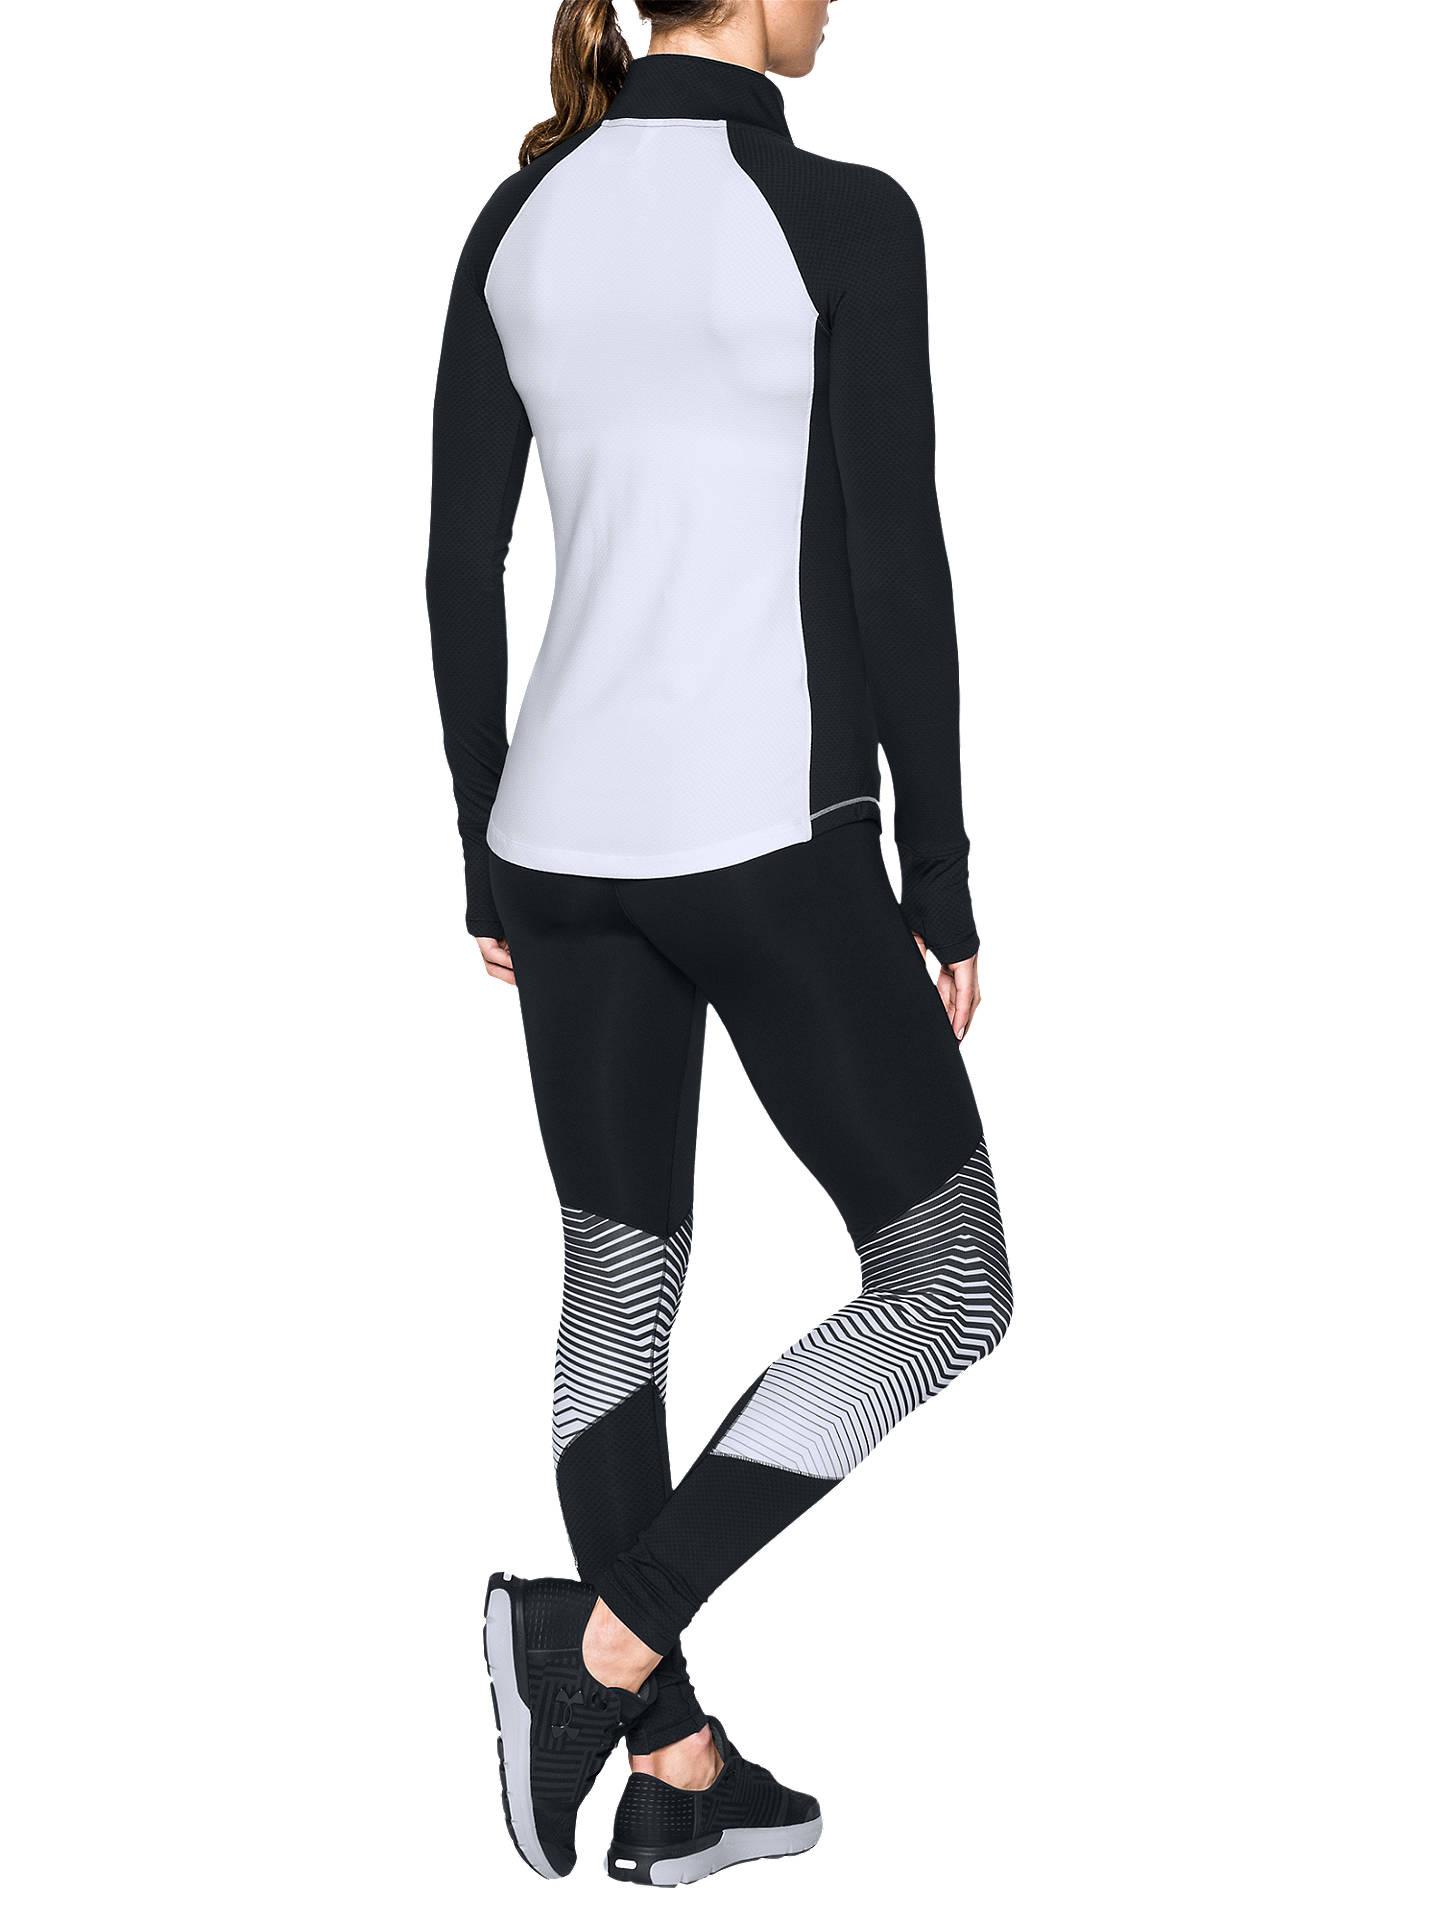 0b2be3771e1feb ... Buy Under Armour ColdGear Reactor Zip Long Sleeve Training Shirt, White/ Black, XS ...